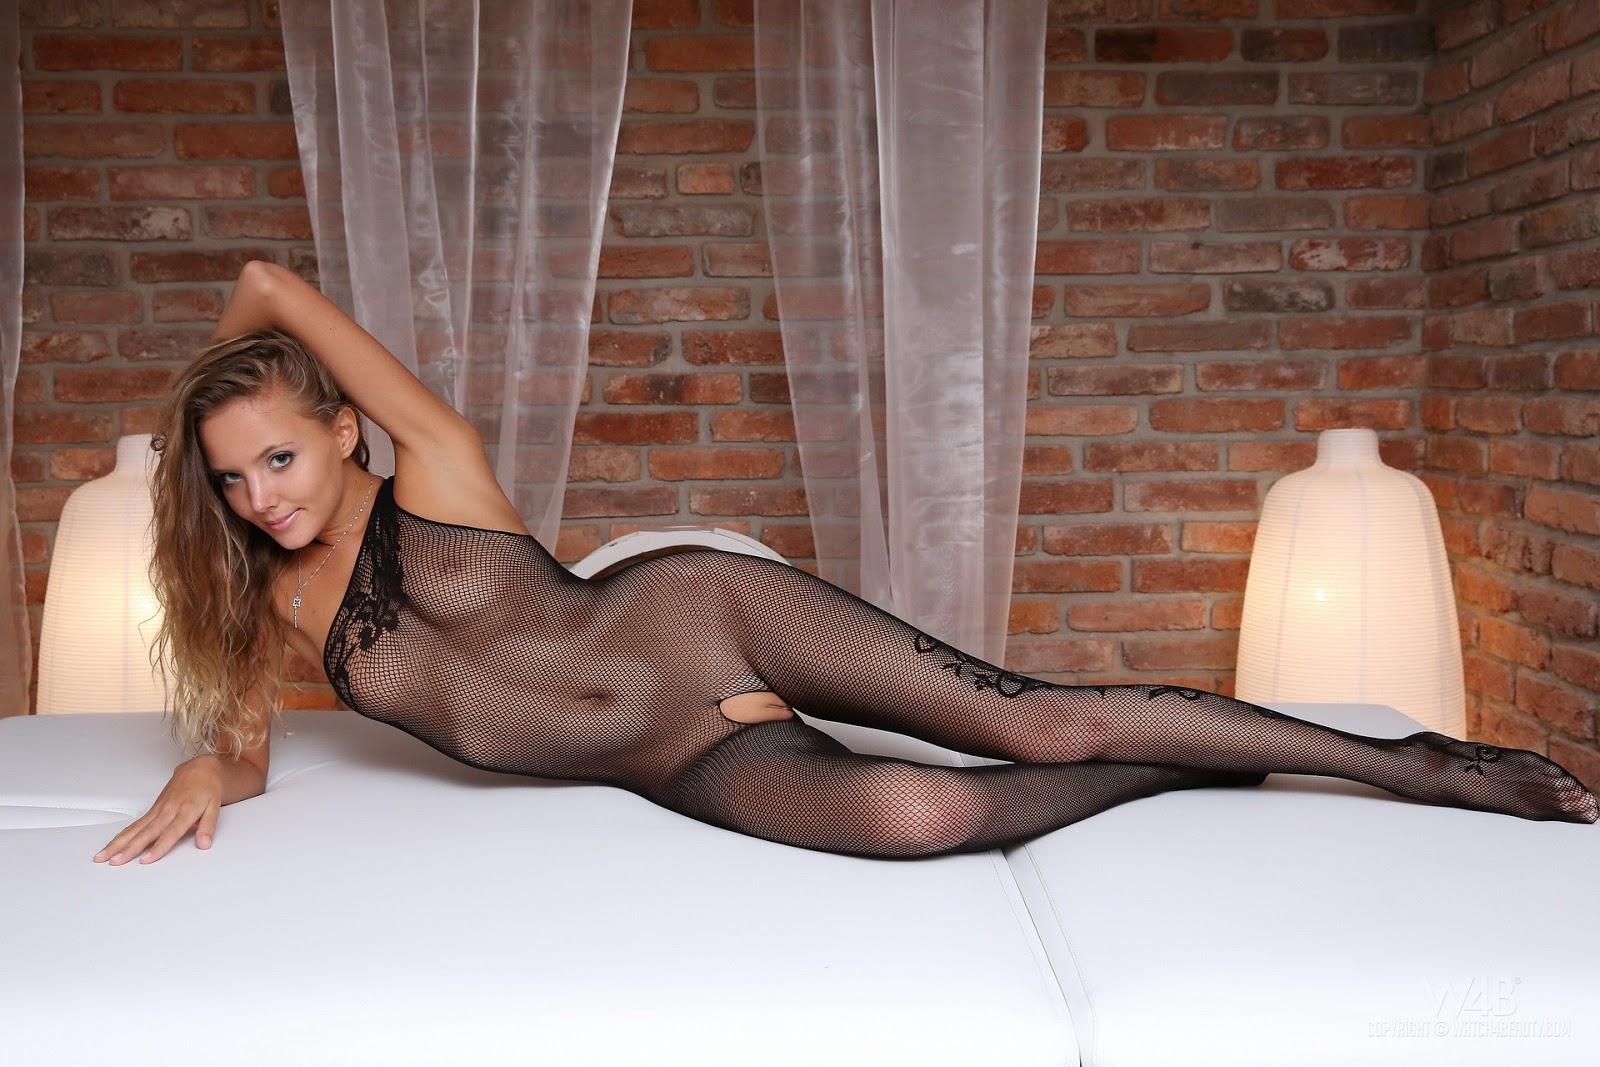 Чулки и колготки на голое тело порно 5 фотография